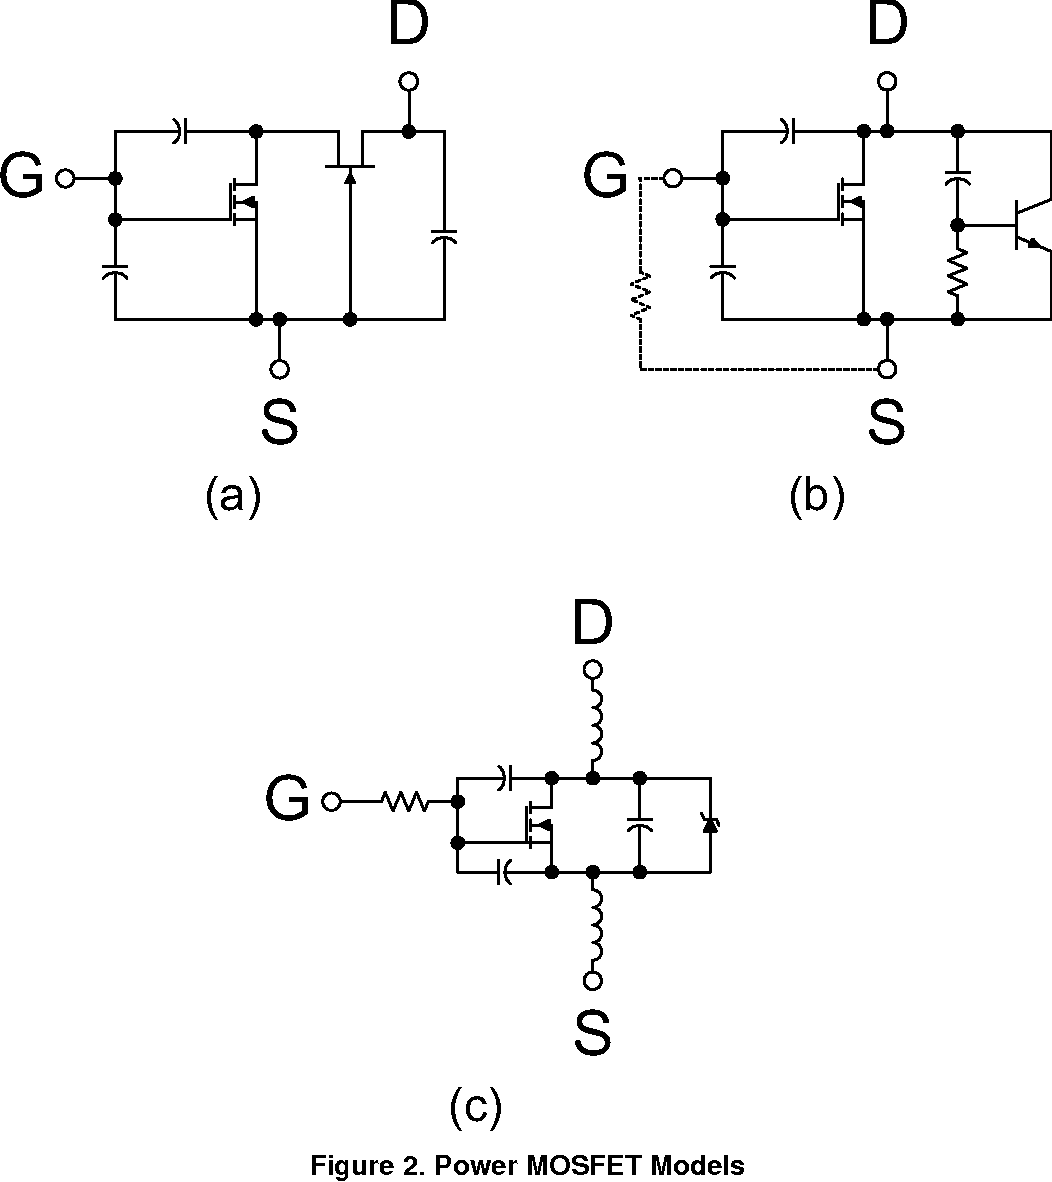 Fundamentals Of Mosfet And Igbt Gate Driver Circuits Semantic Scholar Circuit Design